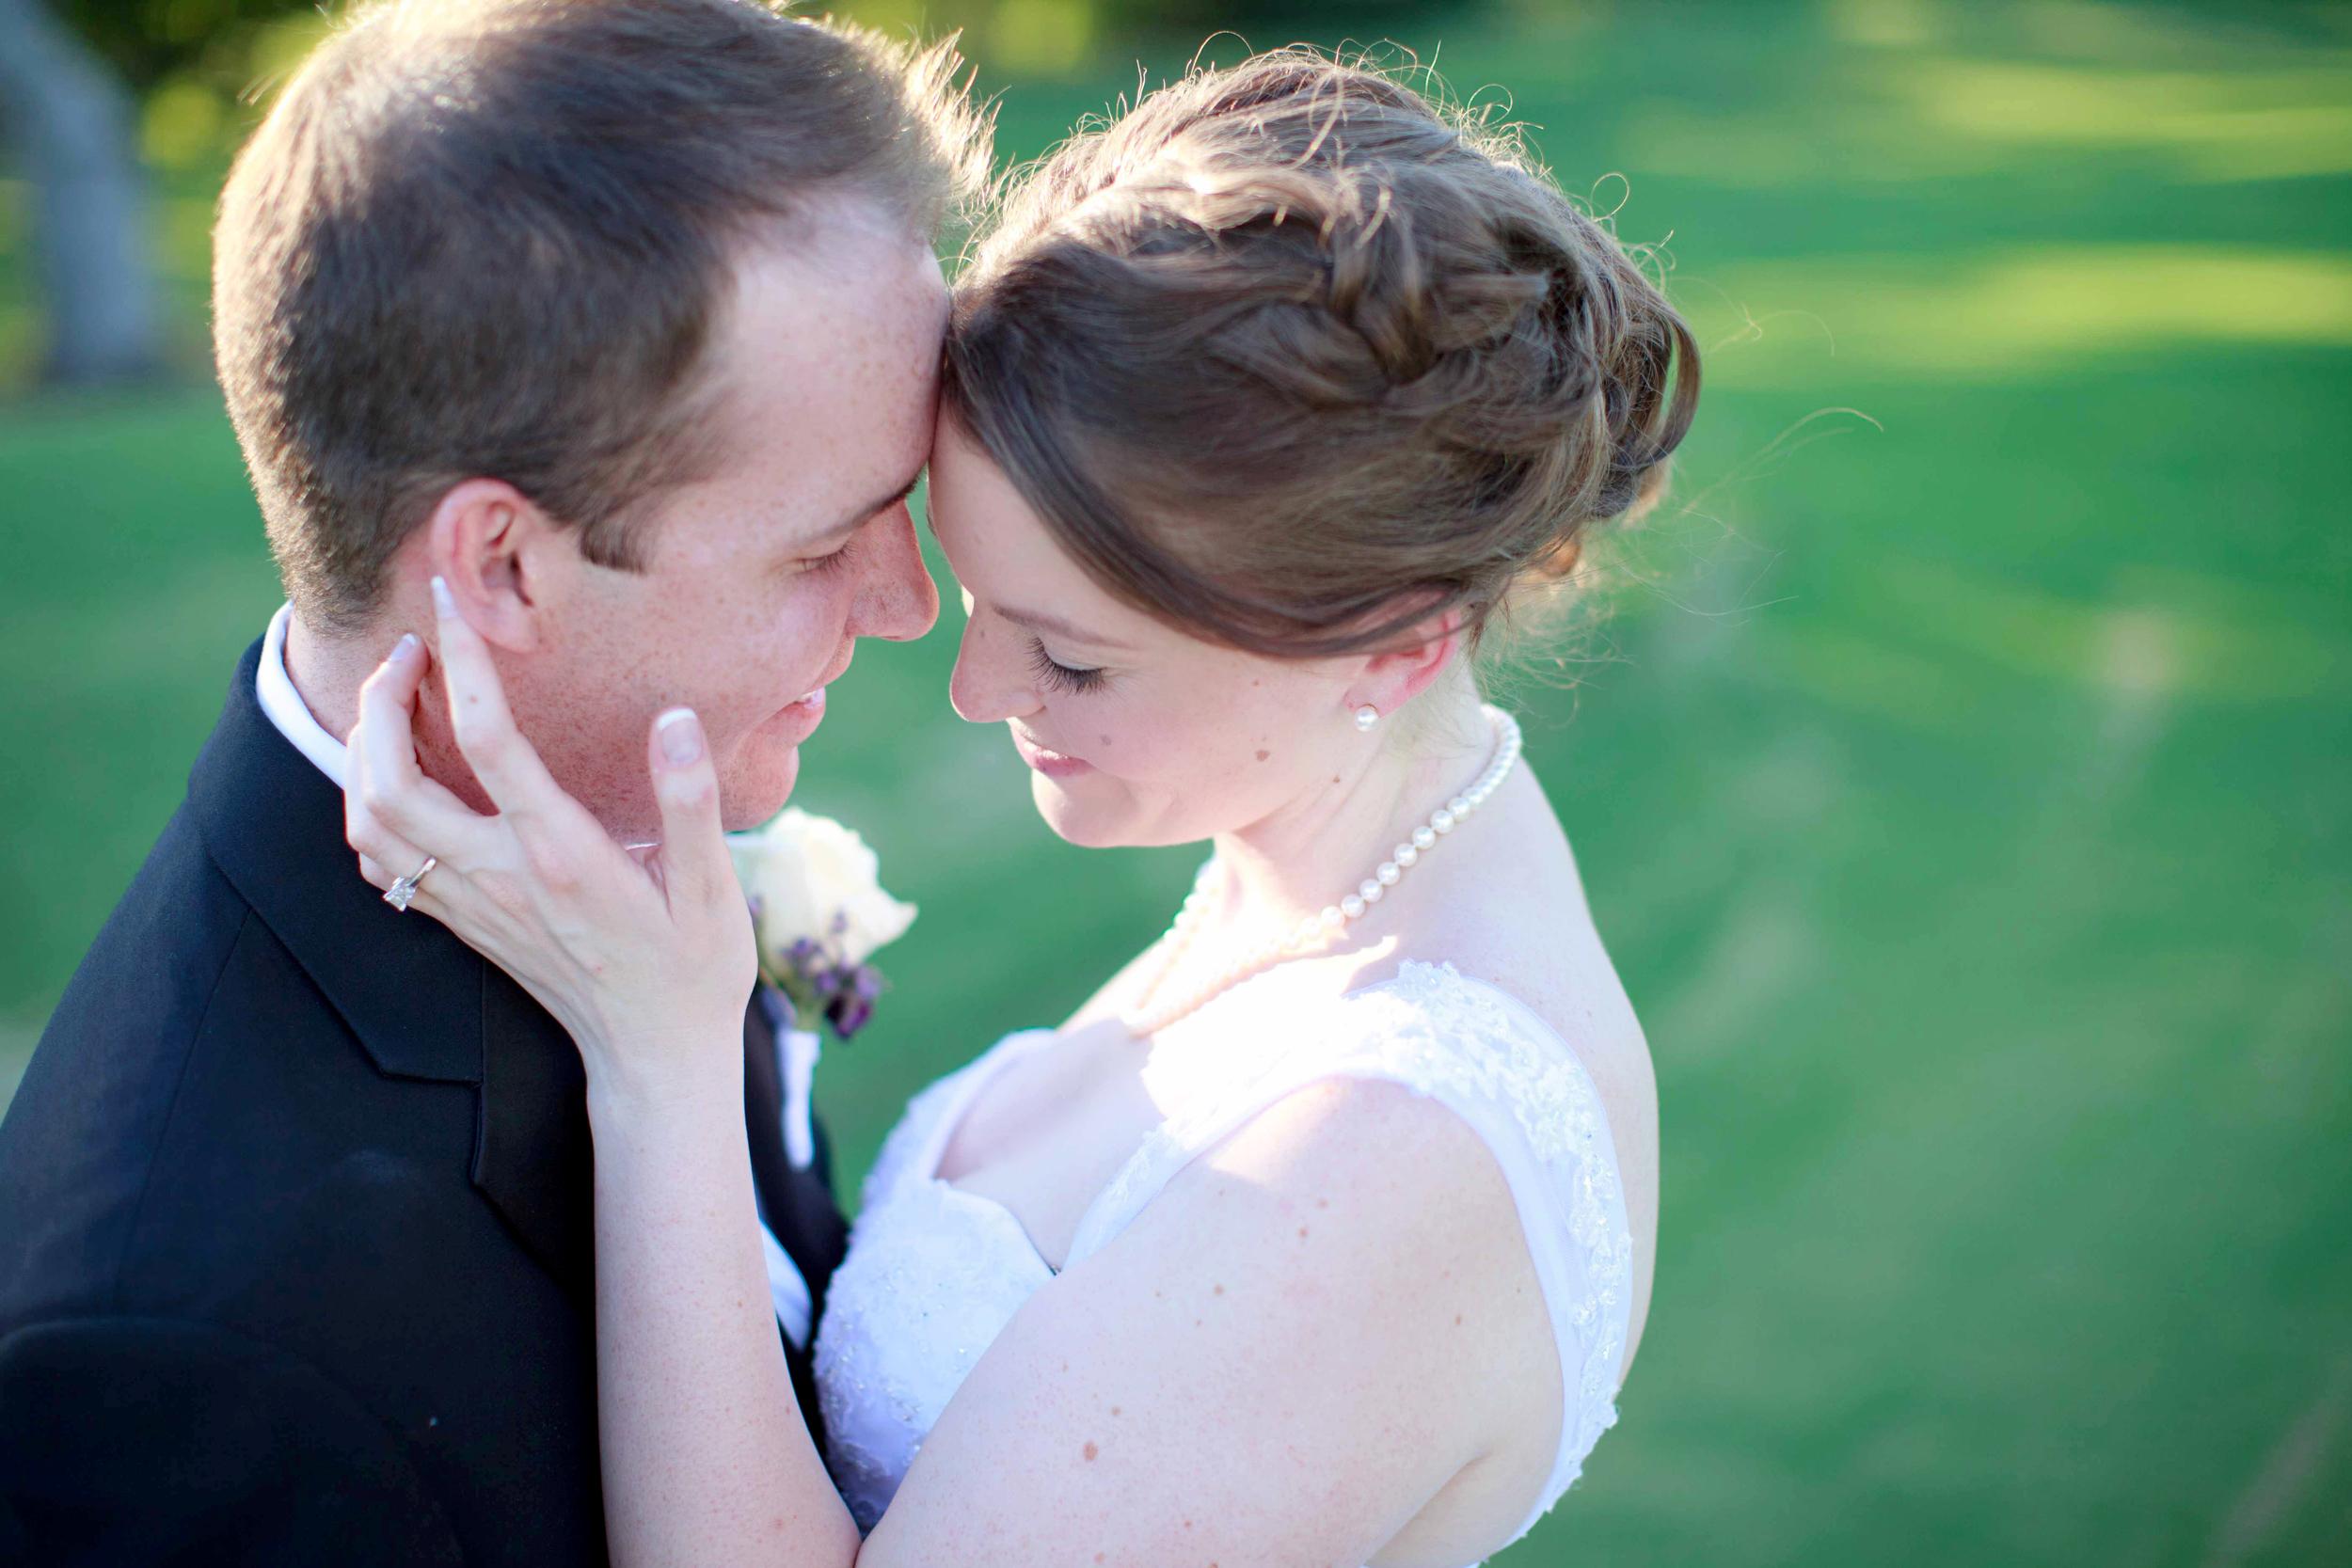 wedding-1-3 copy.JPG